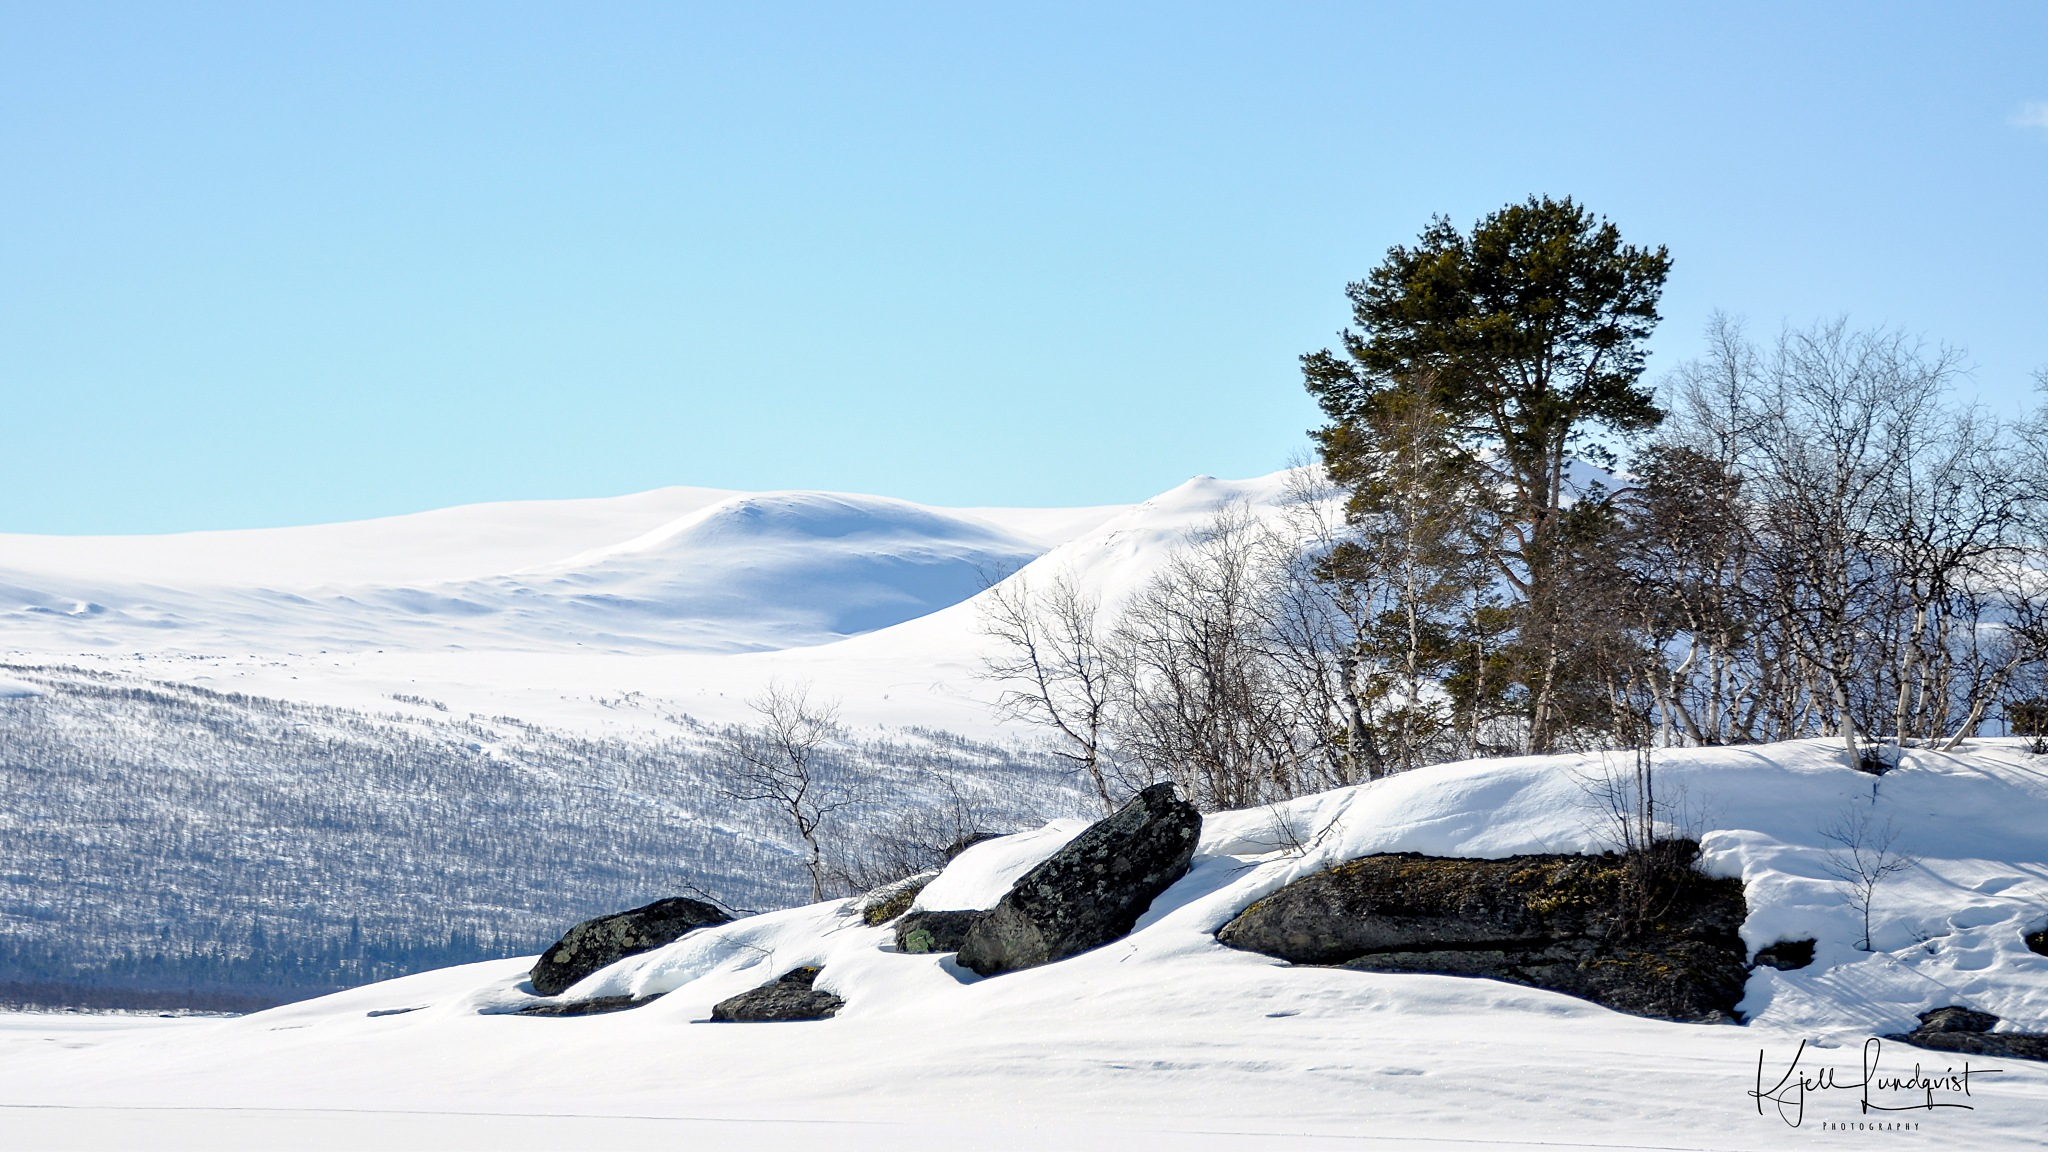 Winterday by Kjell Lundqvist